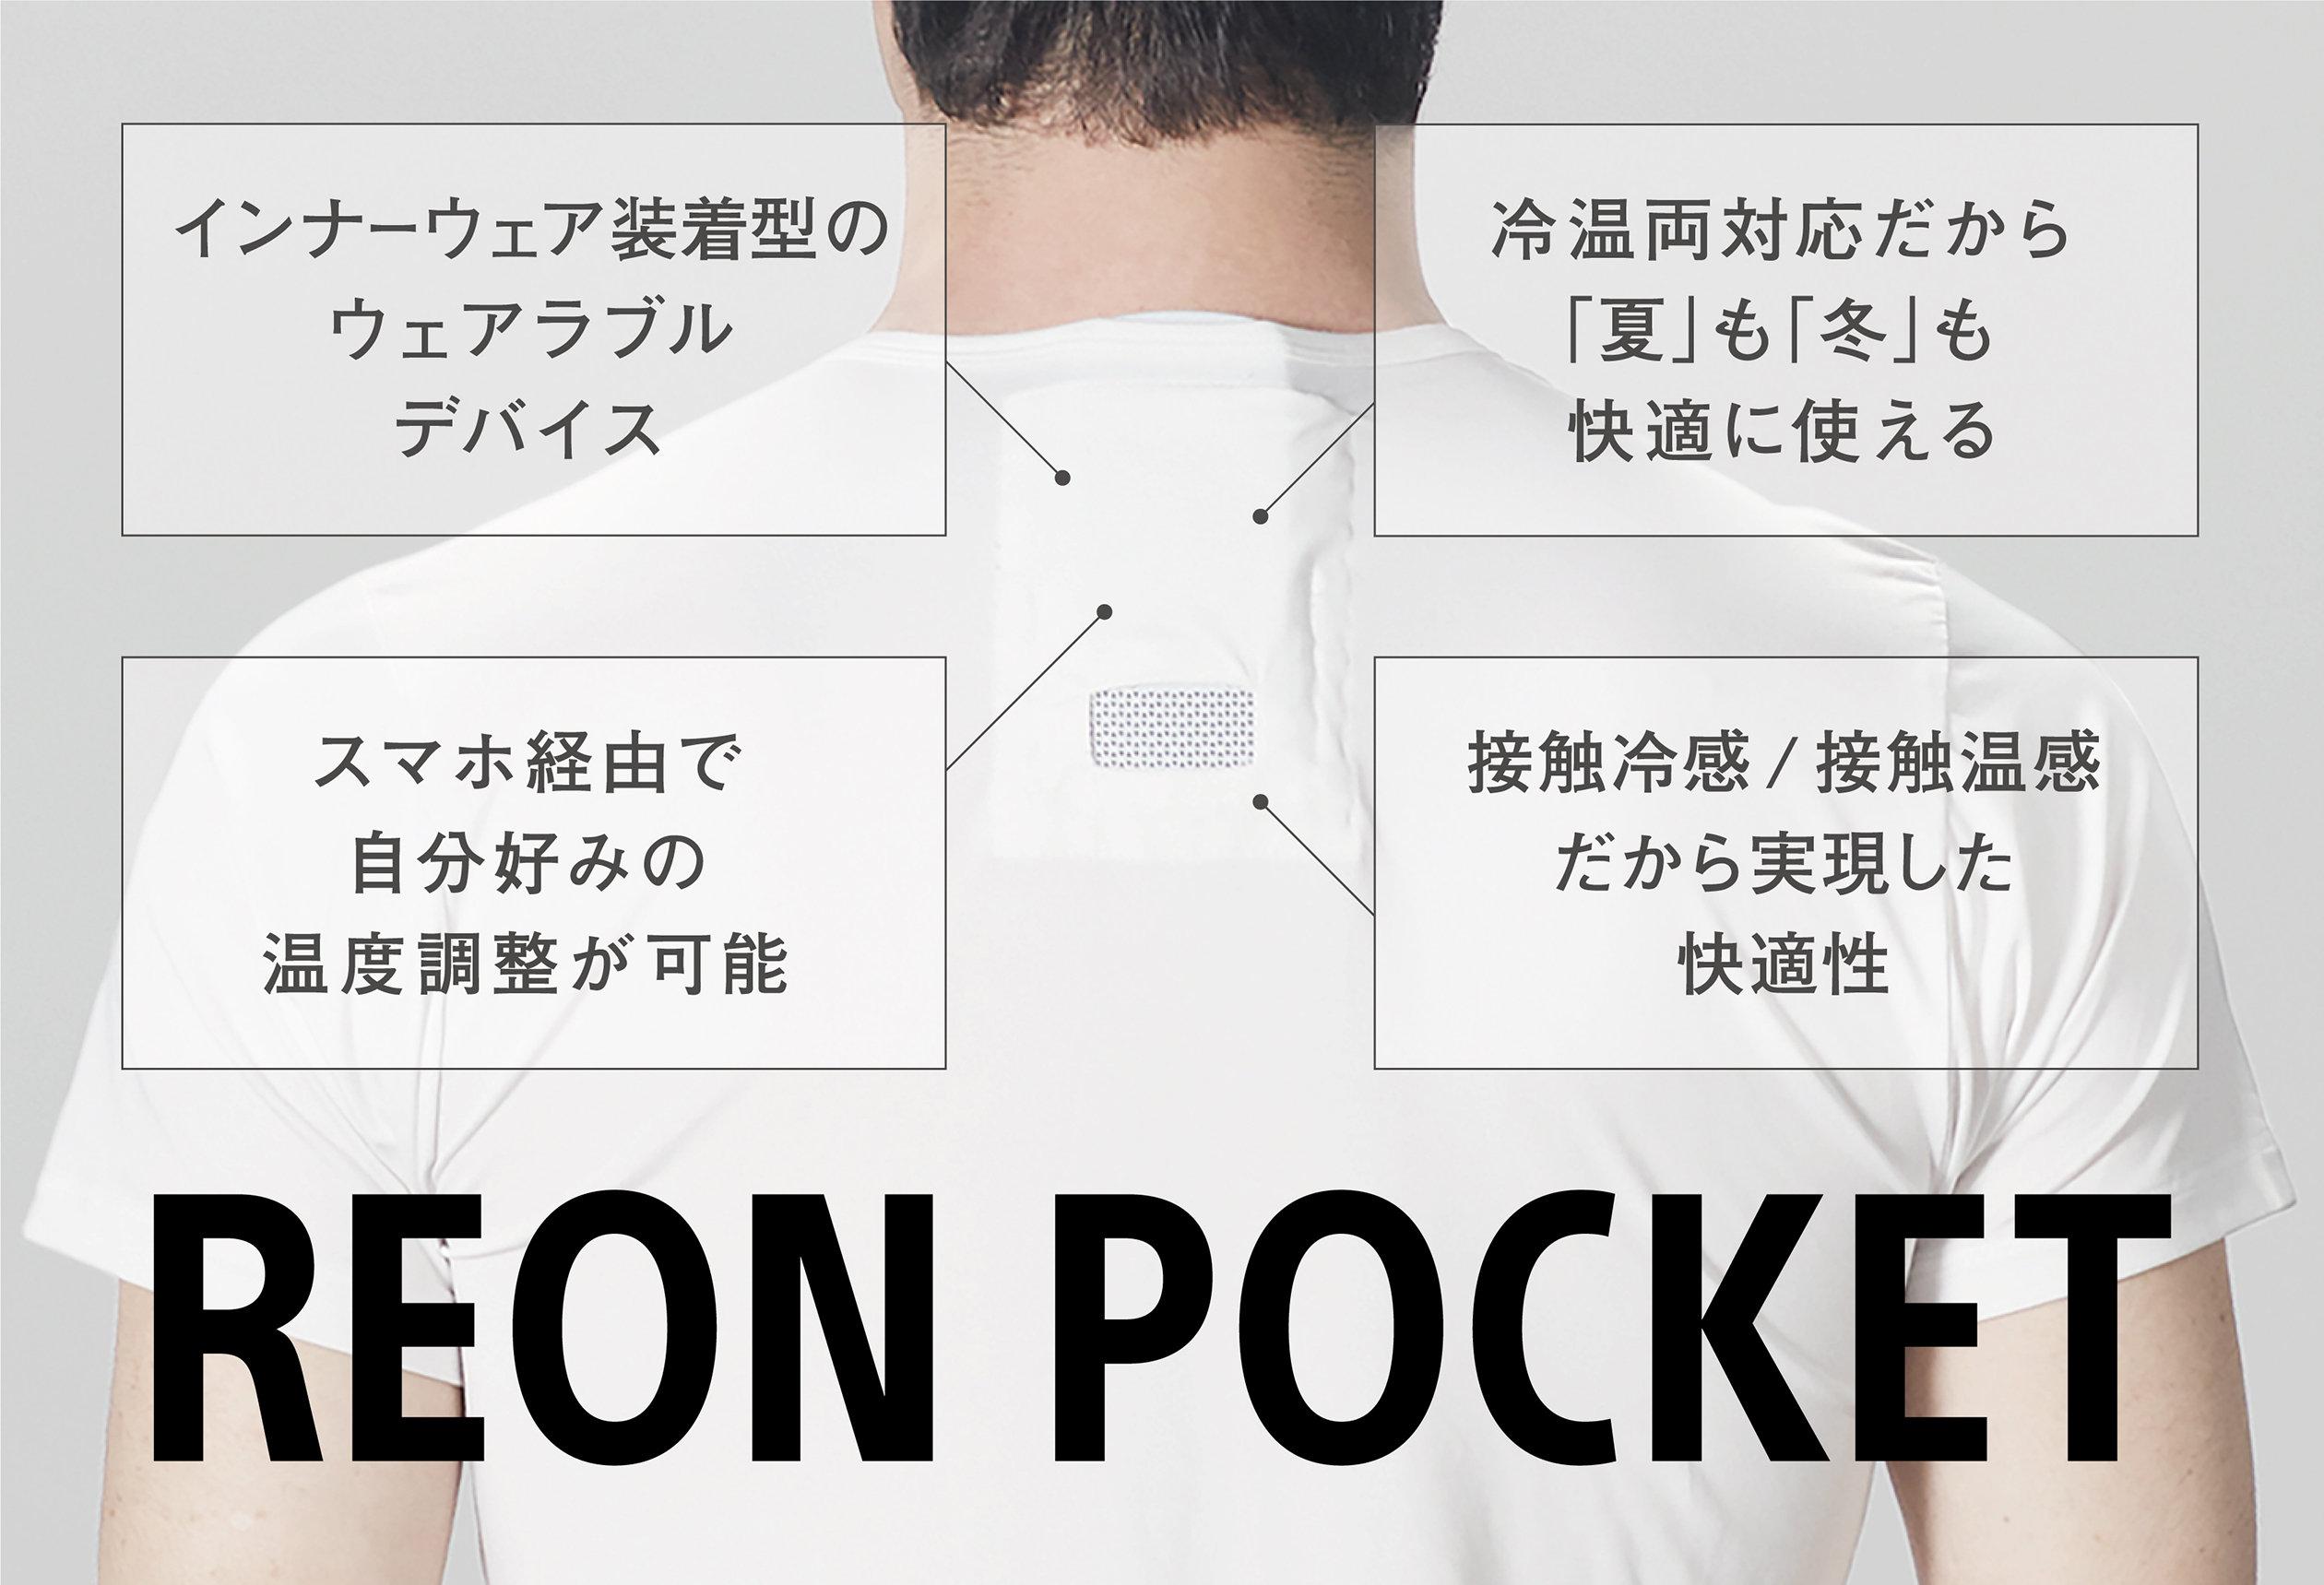 Sony 的「穿戴式空調」Reon Pocket 集資�!能降溫 13 度防熱浪,天氣寒冷還可當暖爐